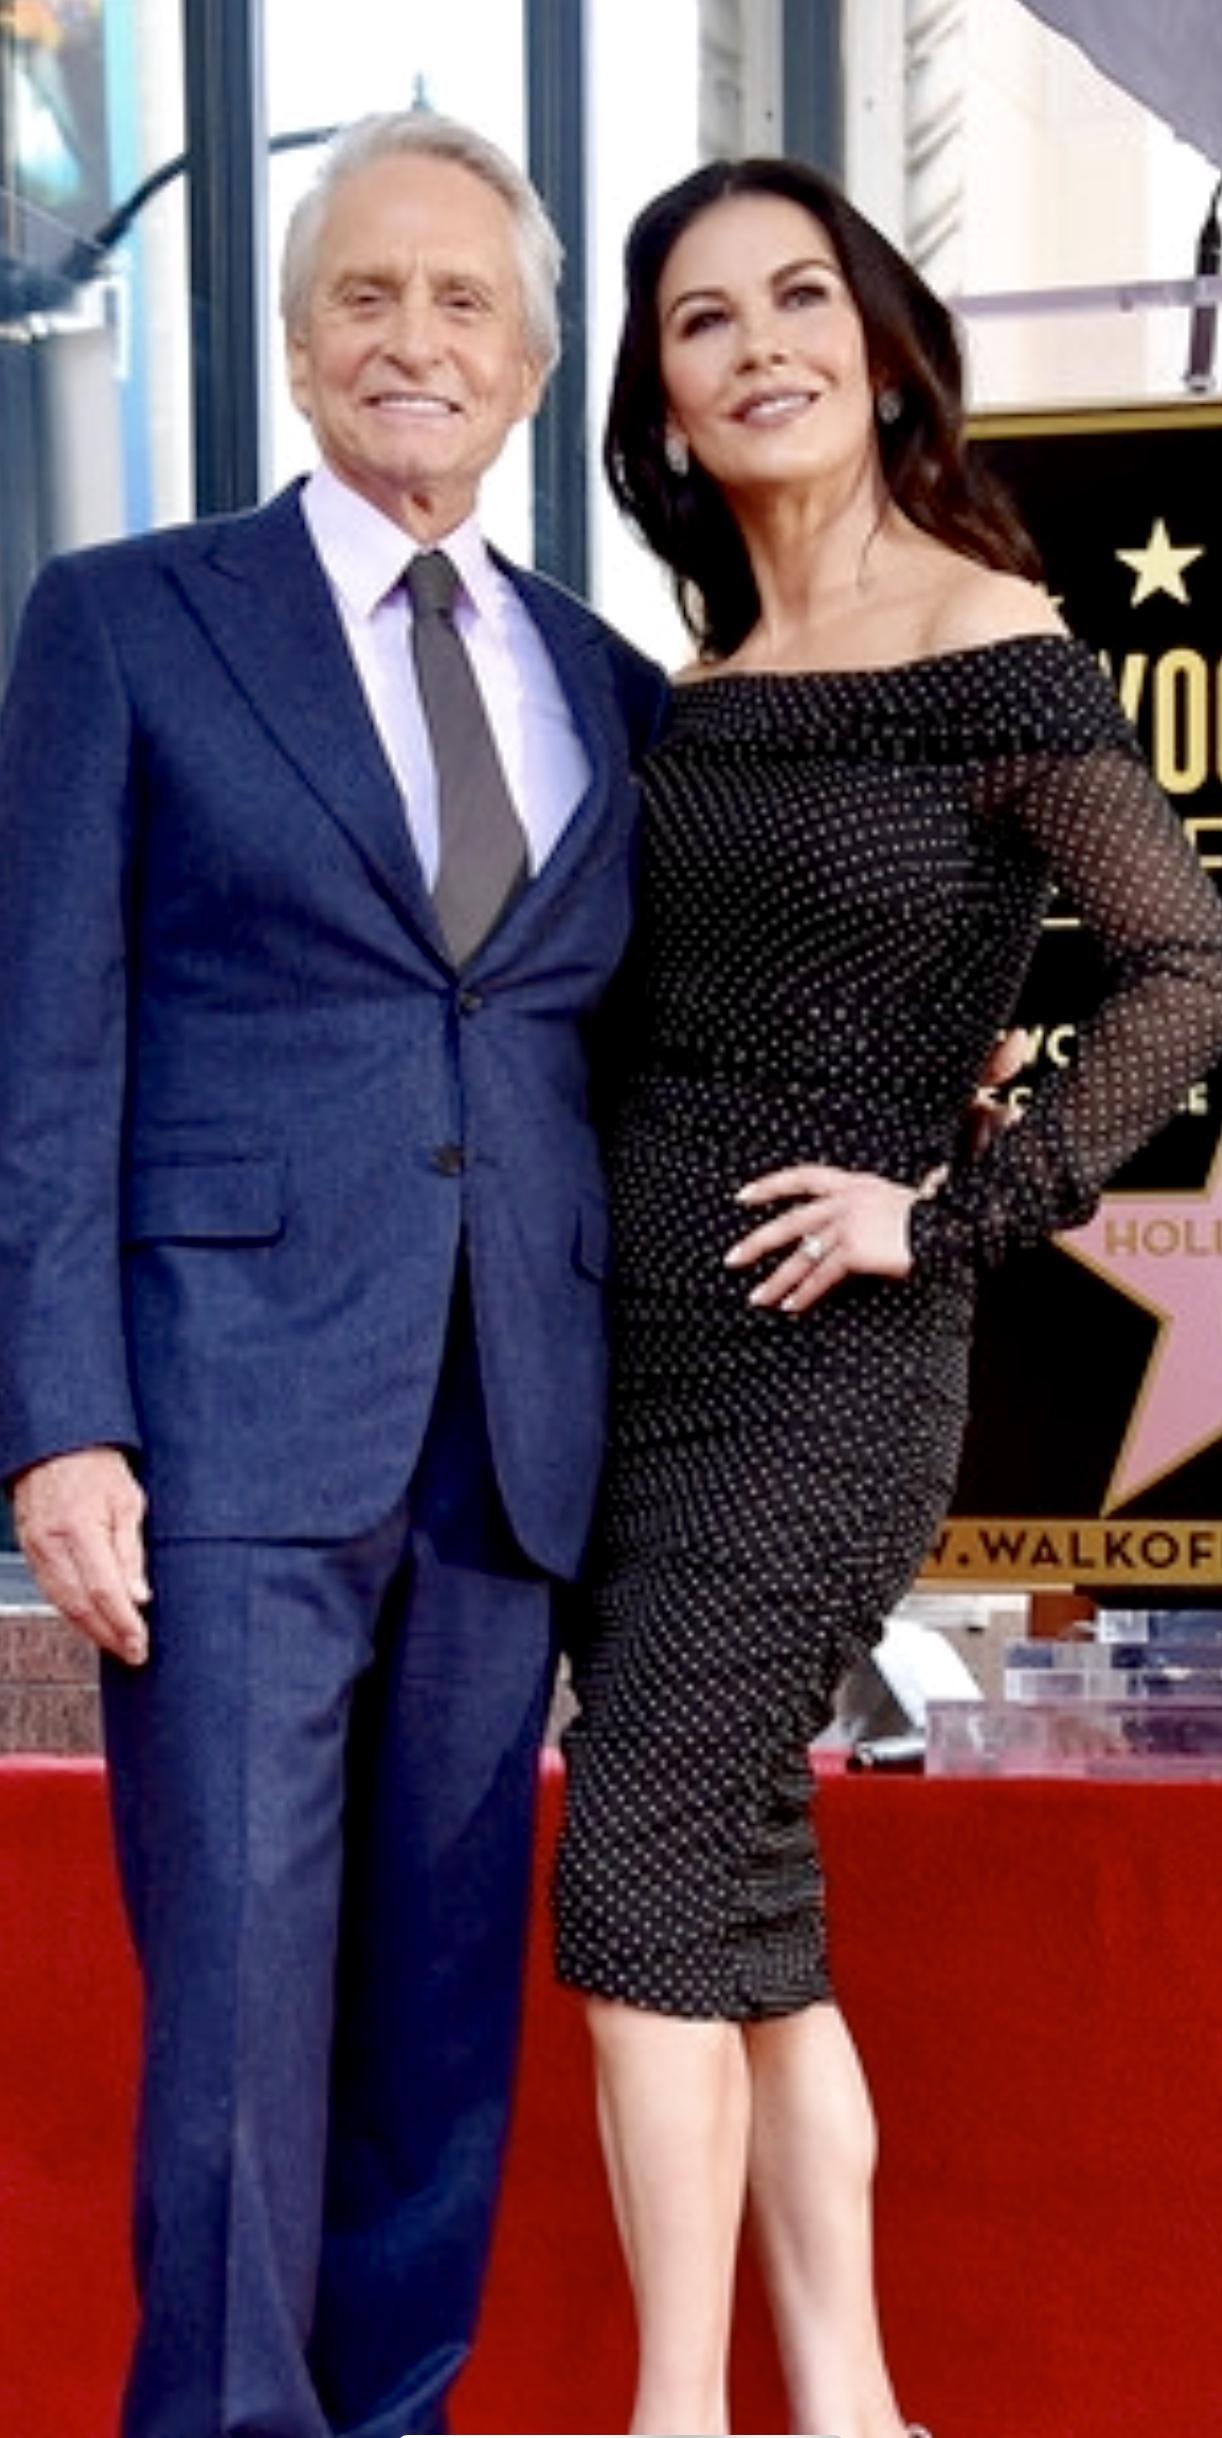 Life Stories: Michael Douglas and Catherine Zeta-Jones 93 Views